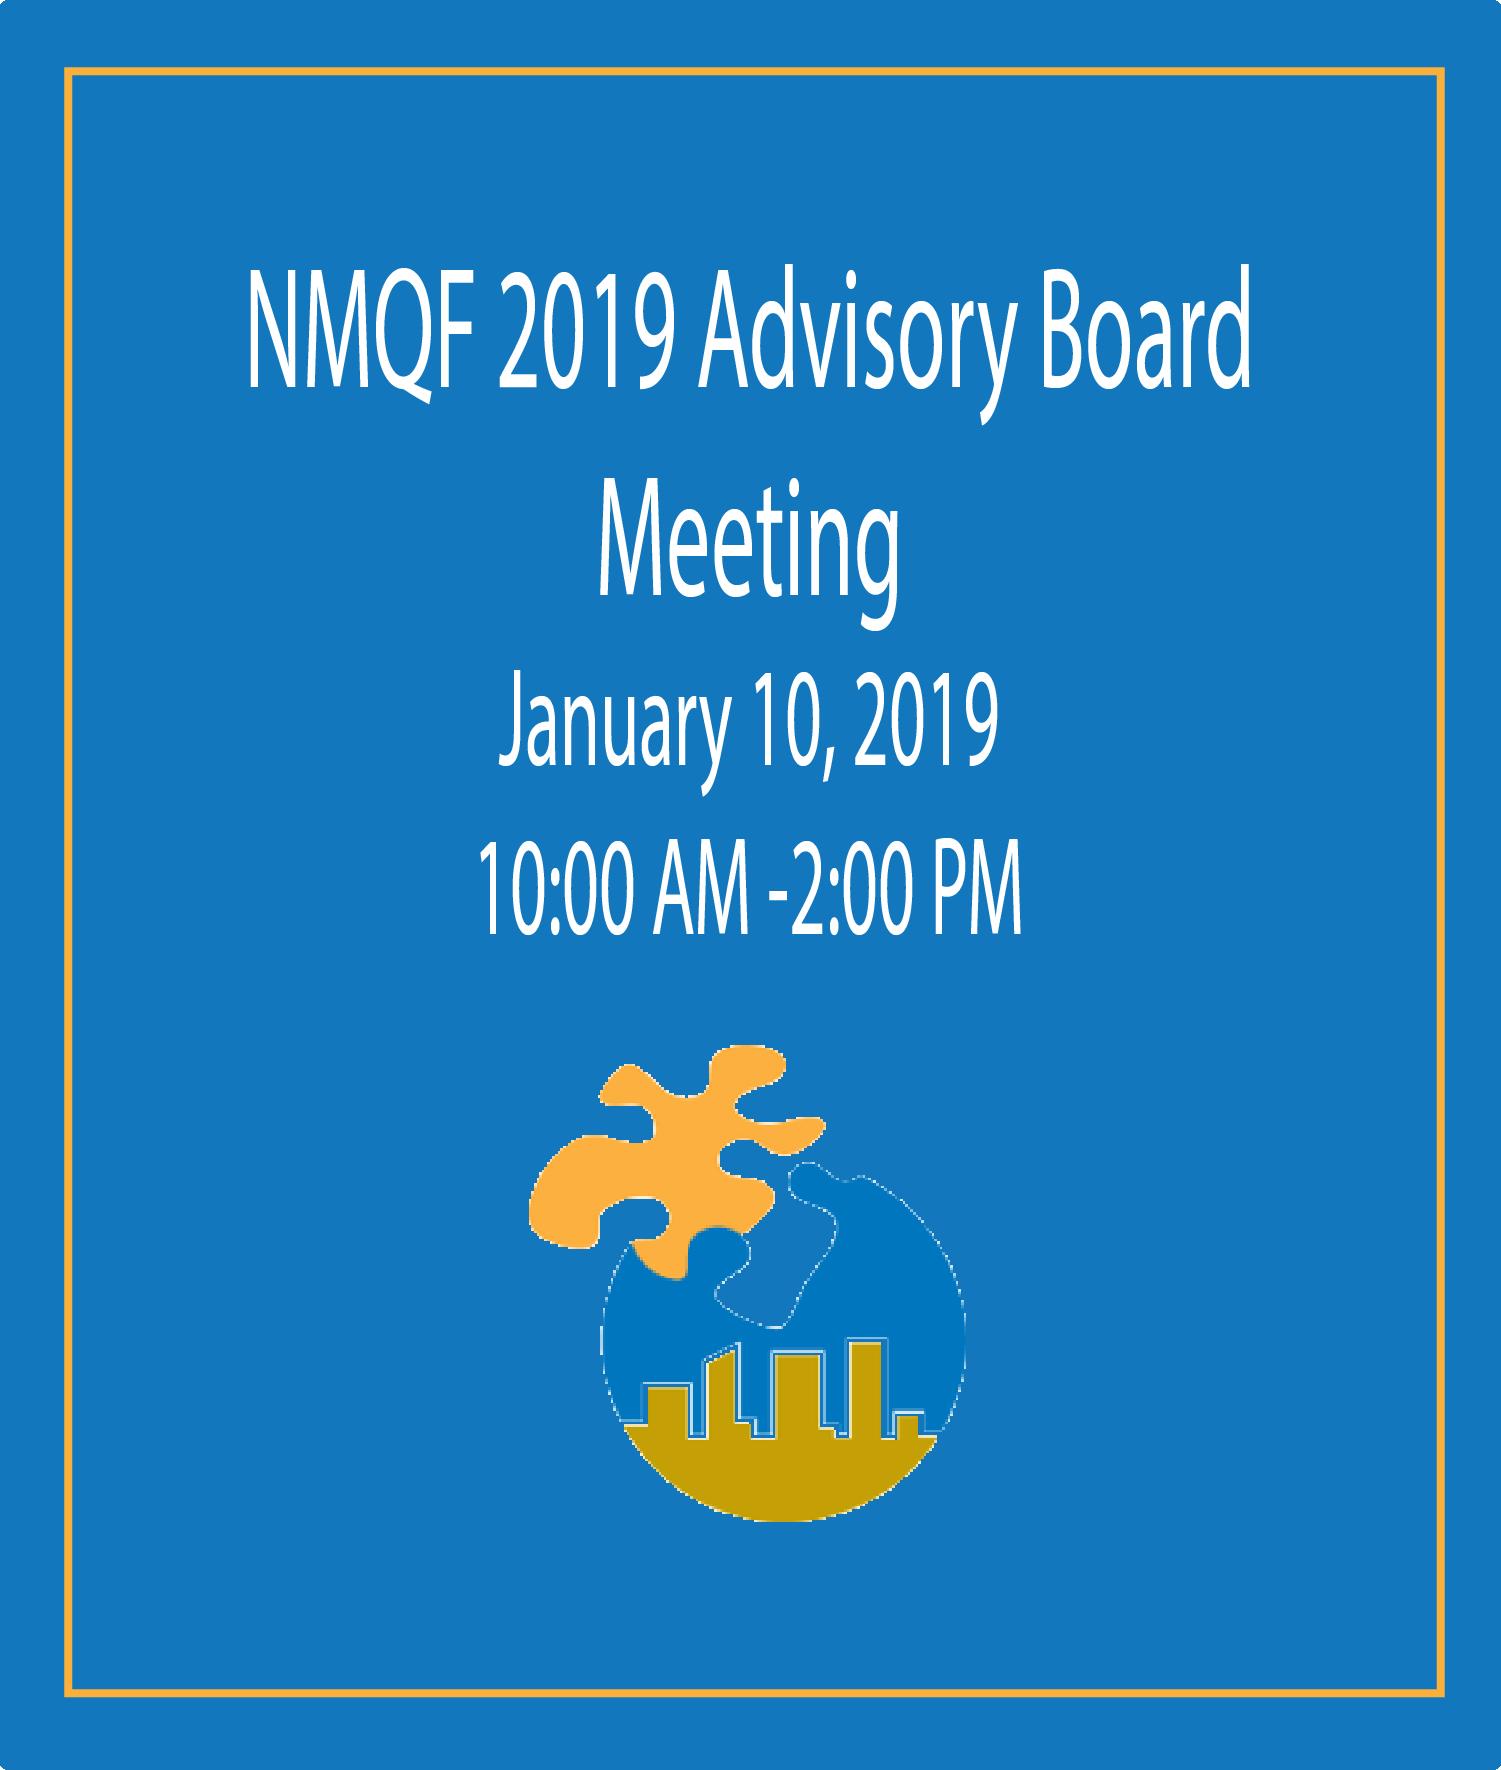 NMQF Advisory Boarding Meeting Flyer